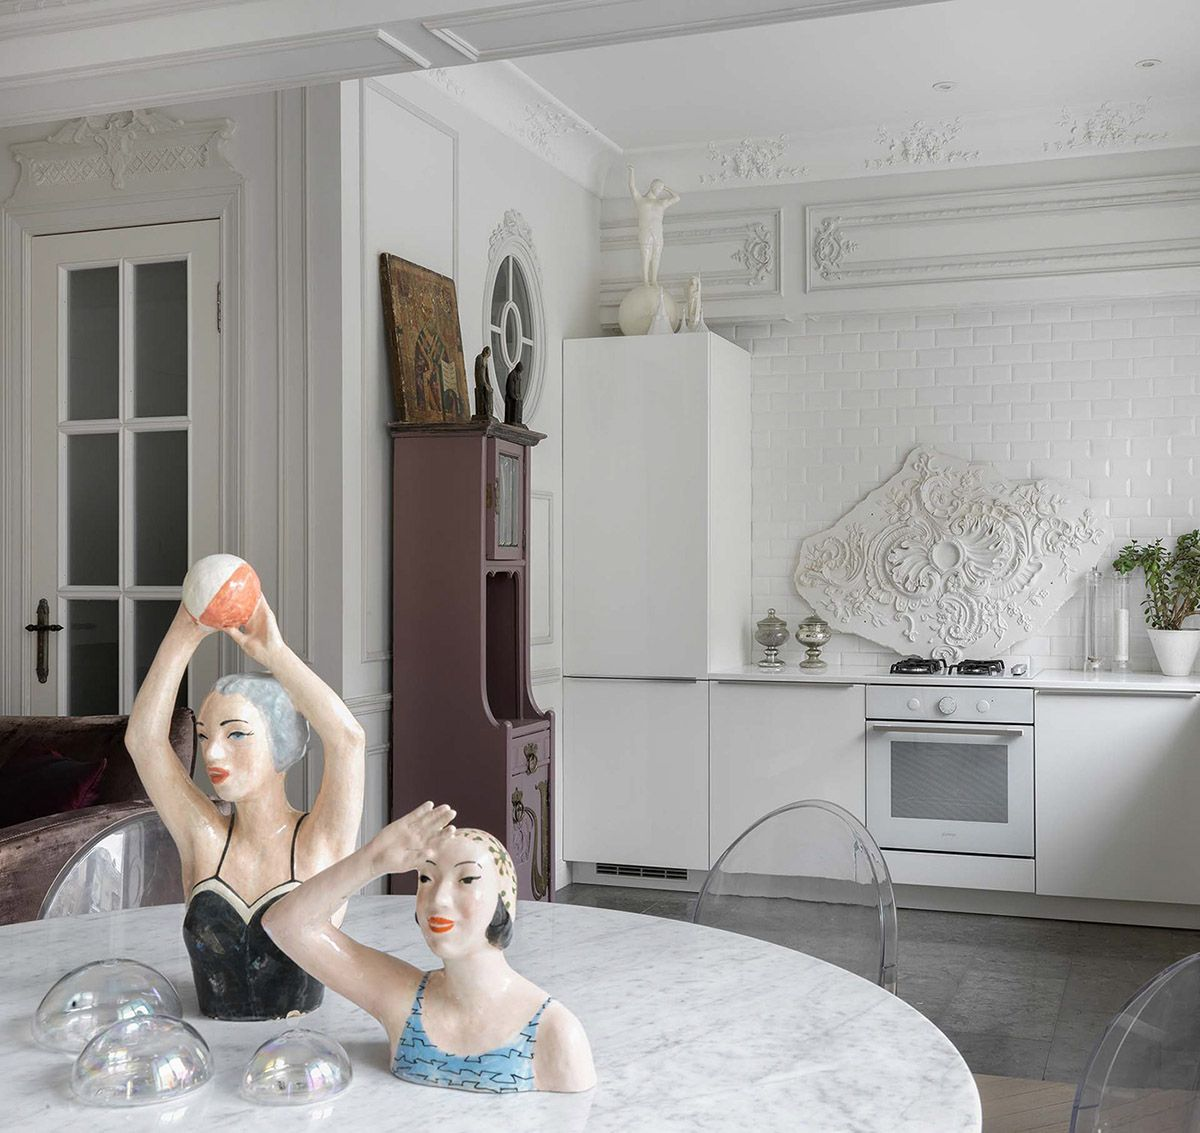 Modern Interior Design Magazine: Home Of Surreal Interiors & Modern Empire Style